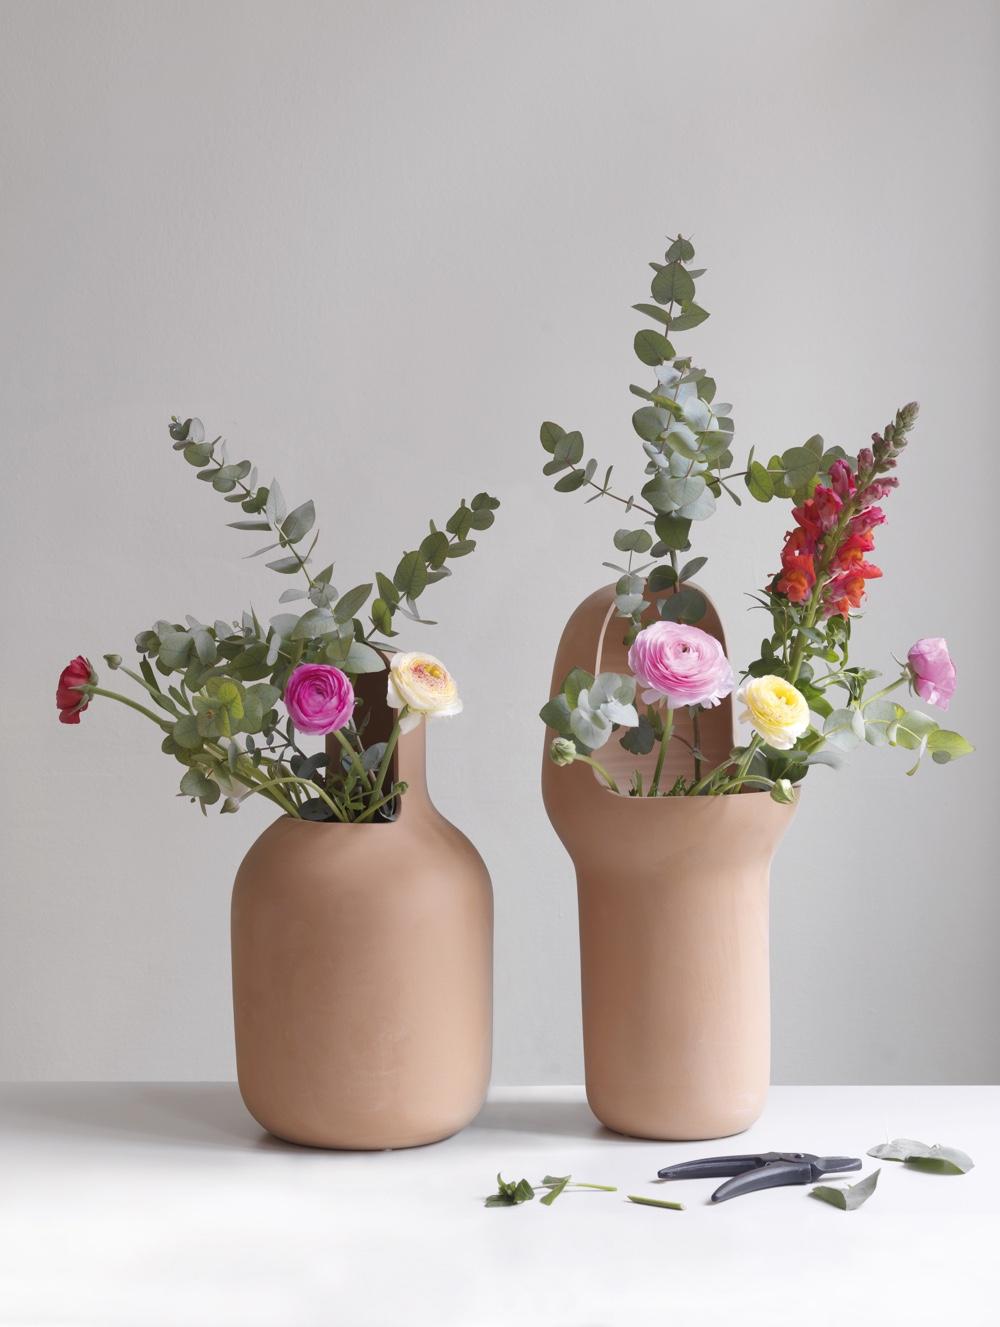 Jaime Hayon - коллекция Gardenias для улицы. Вазы